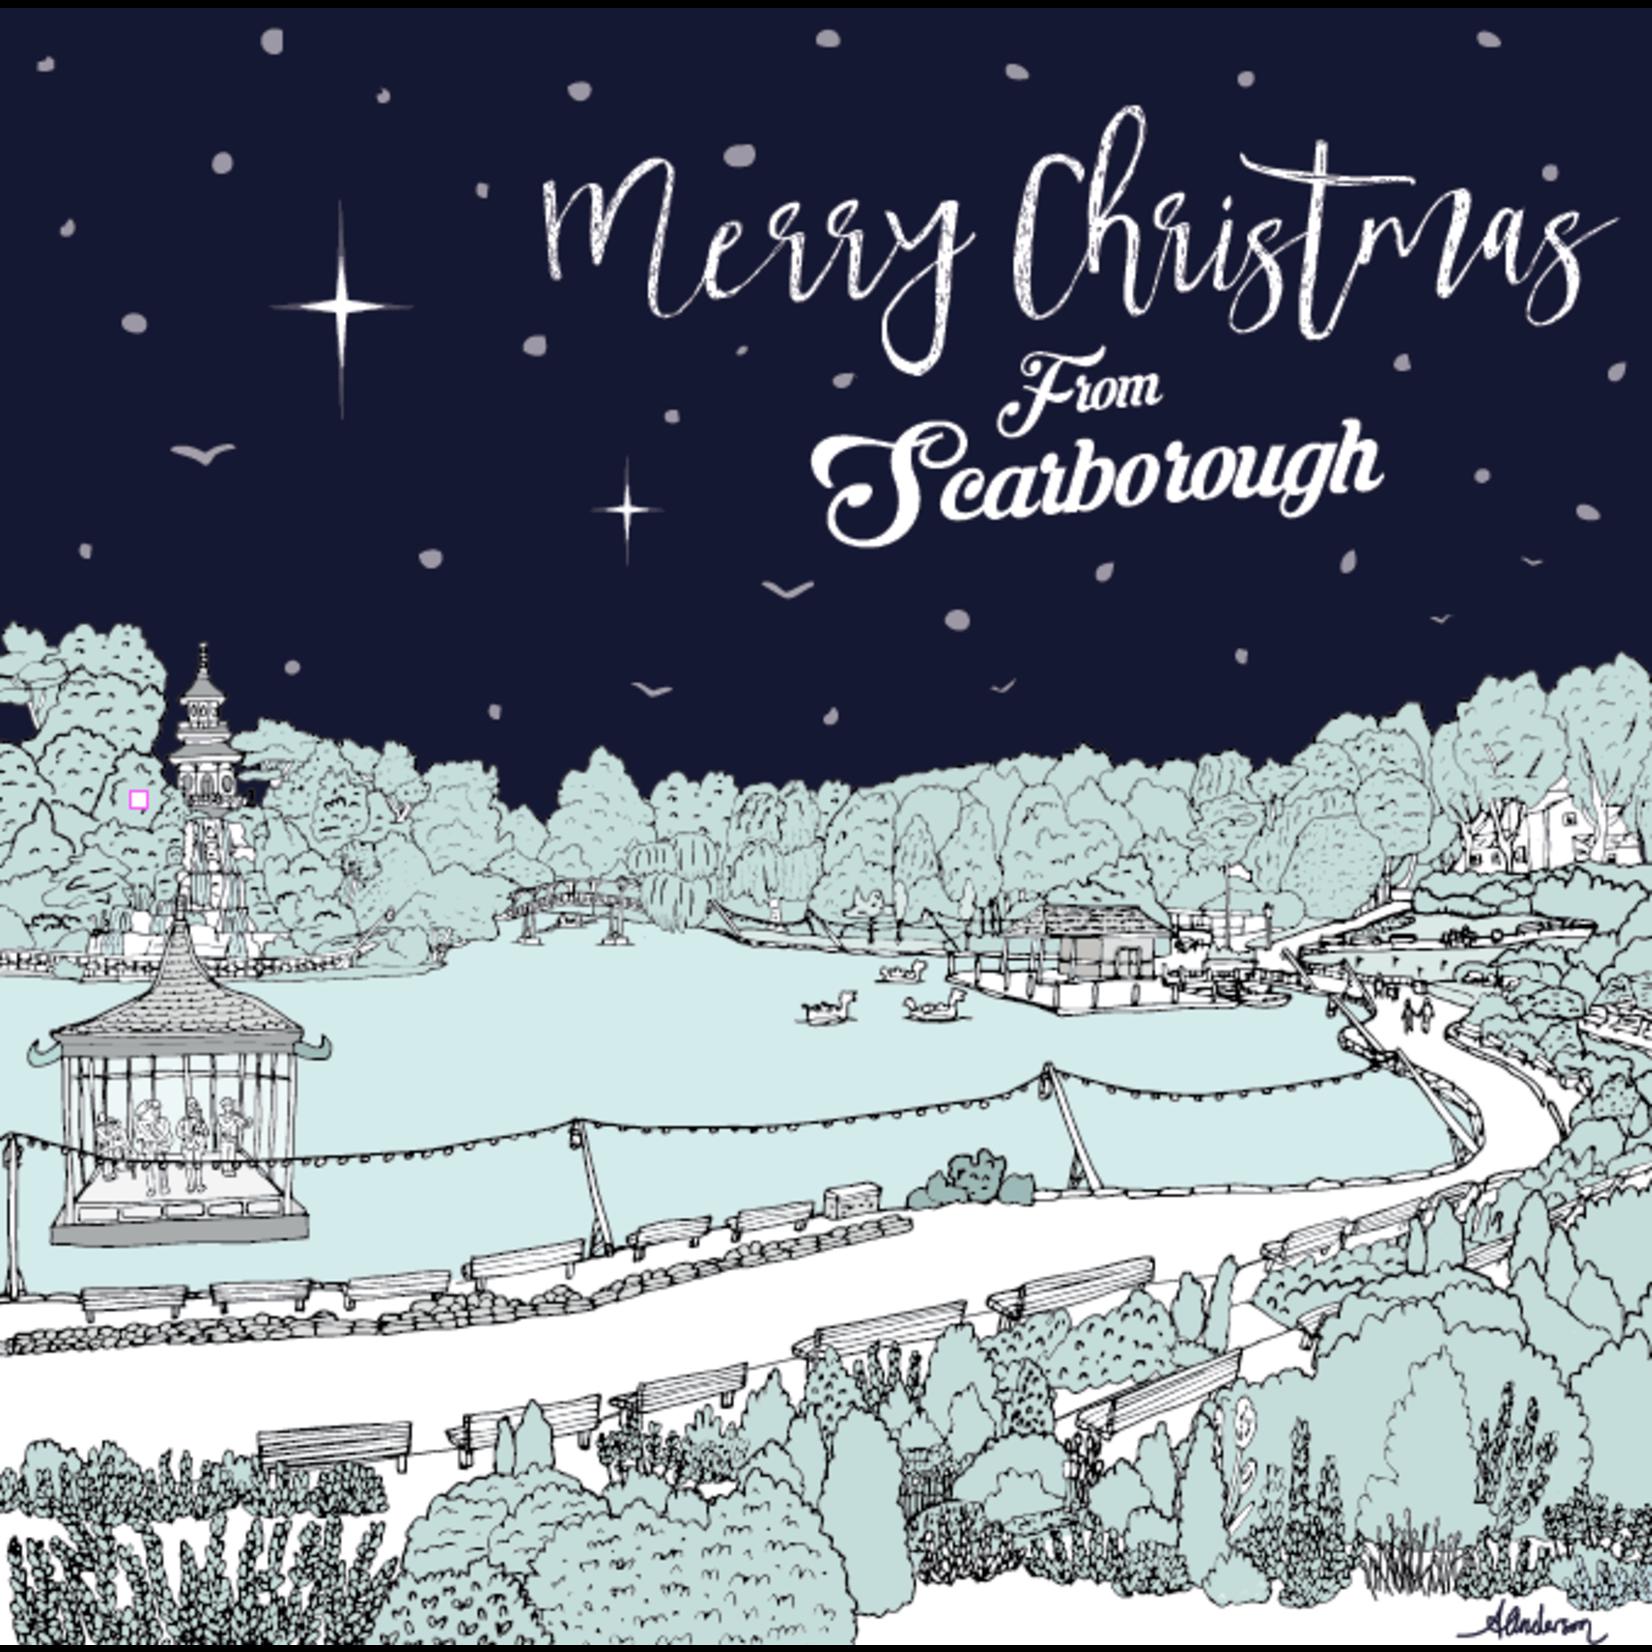 Homebird Cards ALEX ANDERSON 2020 CHRISTMAS CARD ILLUSTRATION SCARBOROUGH PEASHOLM MERRY CHRISTMAS